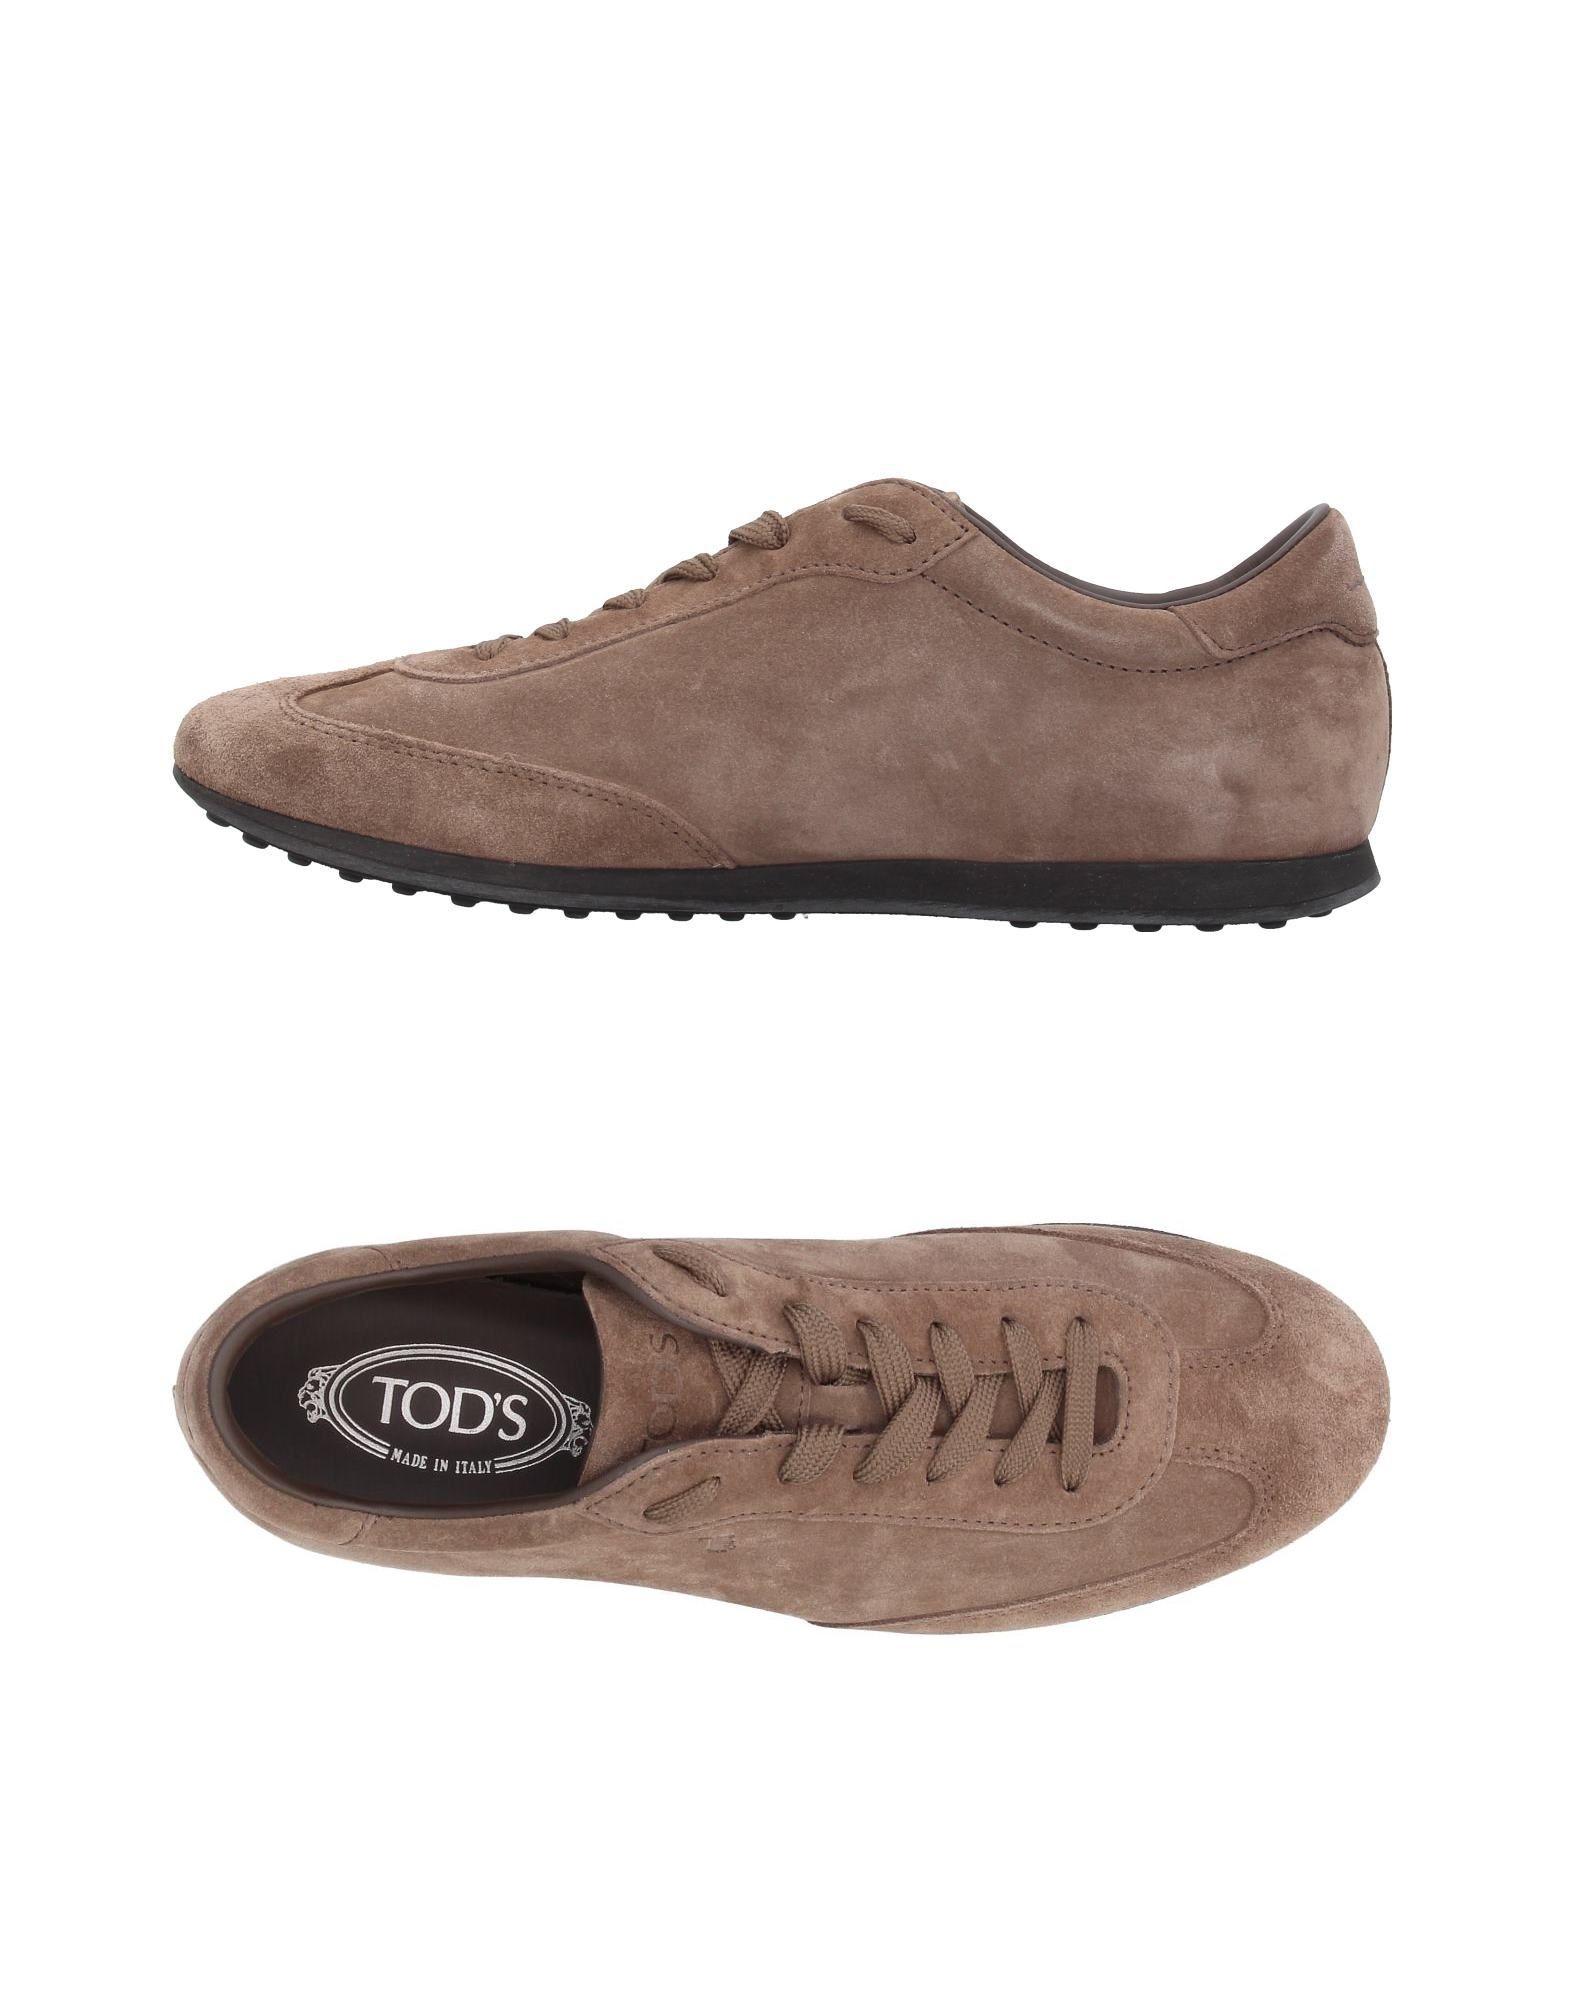 Sneakers online Tods Acquista su Uomo 0na4p0